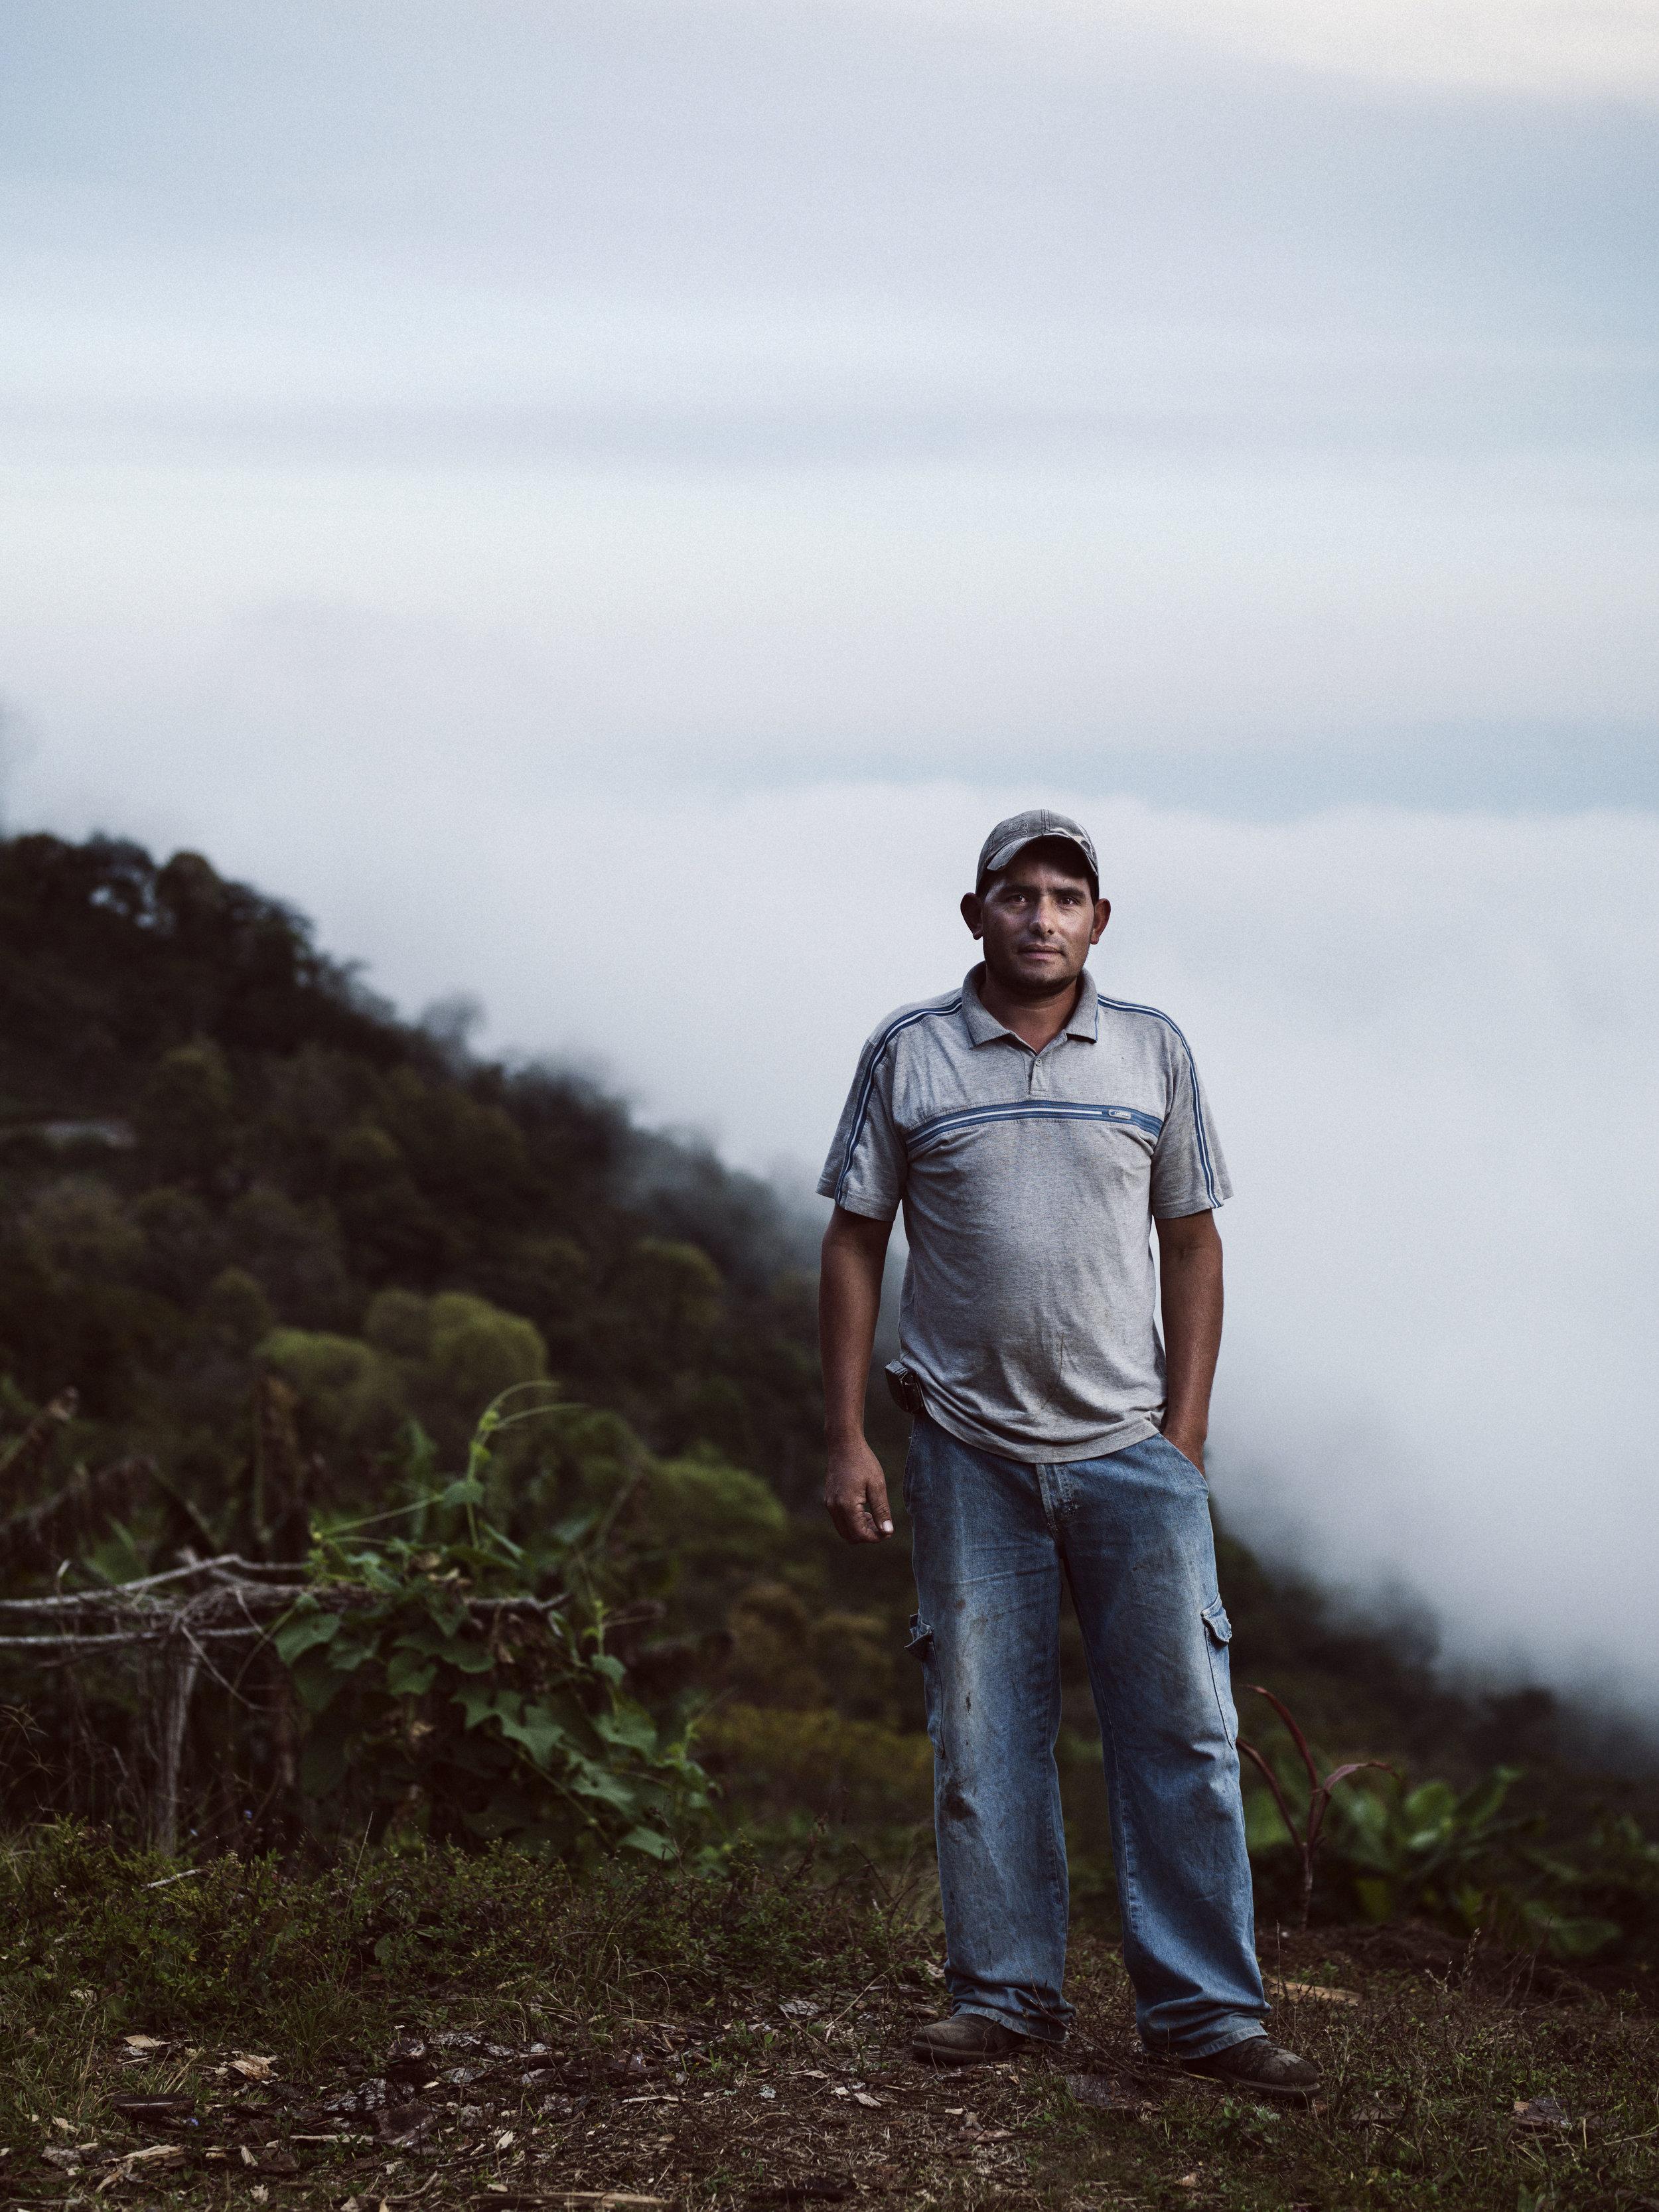 2014_03_08_tk_for_better_coffee_honduras_hasselblad-357_final.jpg